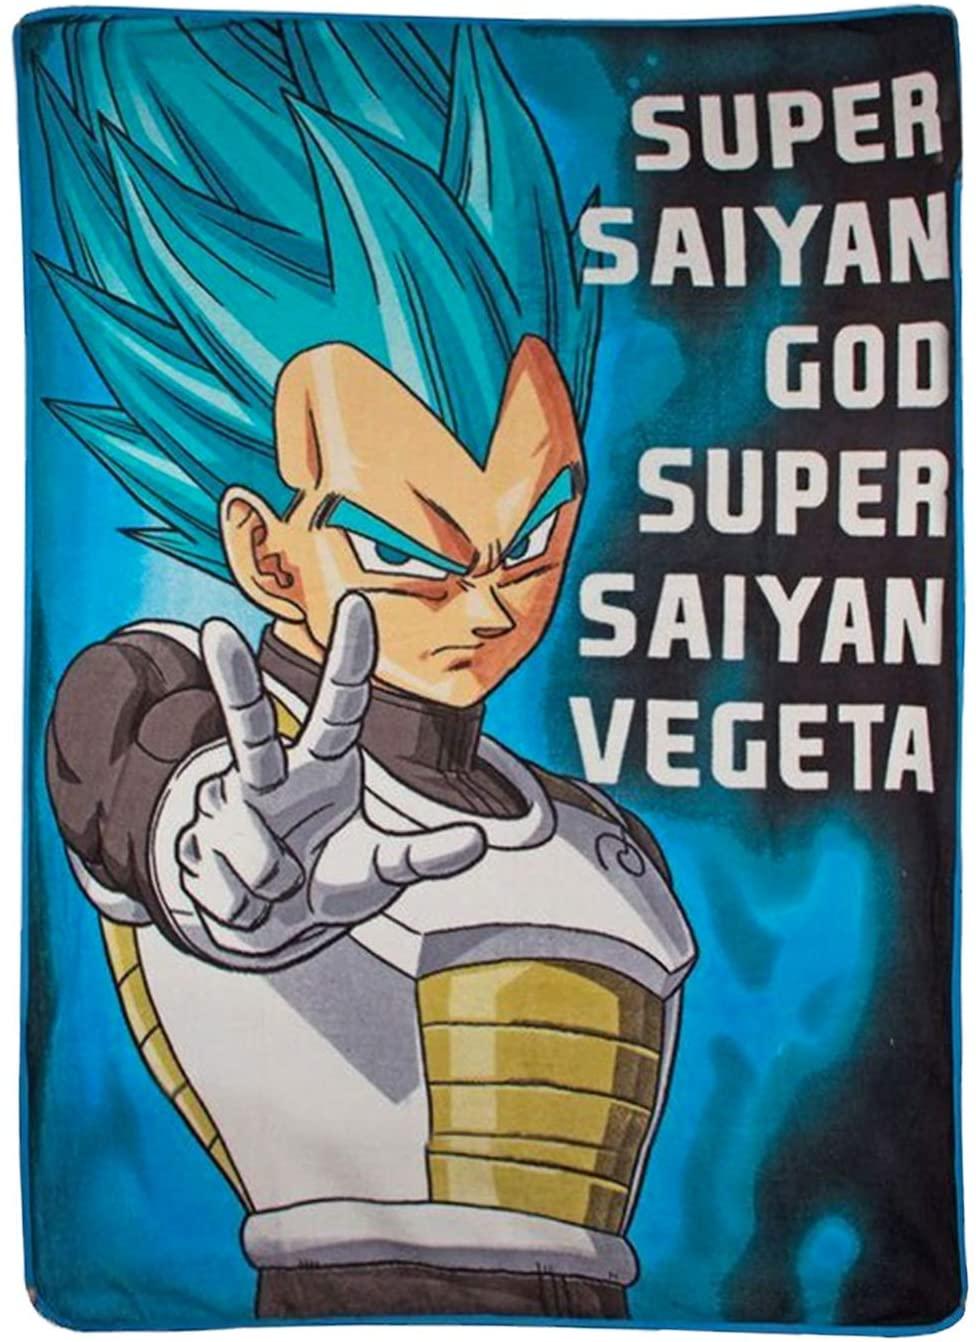 JUST FUNKY Official Dragon Ball Z Super Saiyan God, Super Saiyan Vegeta Premium Warm Fleece Throw Wall Hanging Tapestry/Fleece Throw Blanket